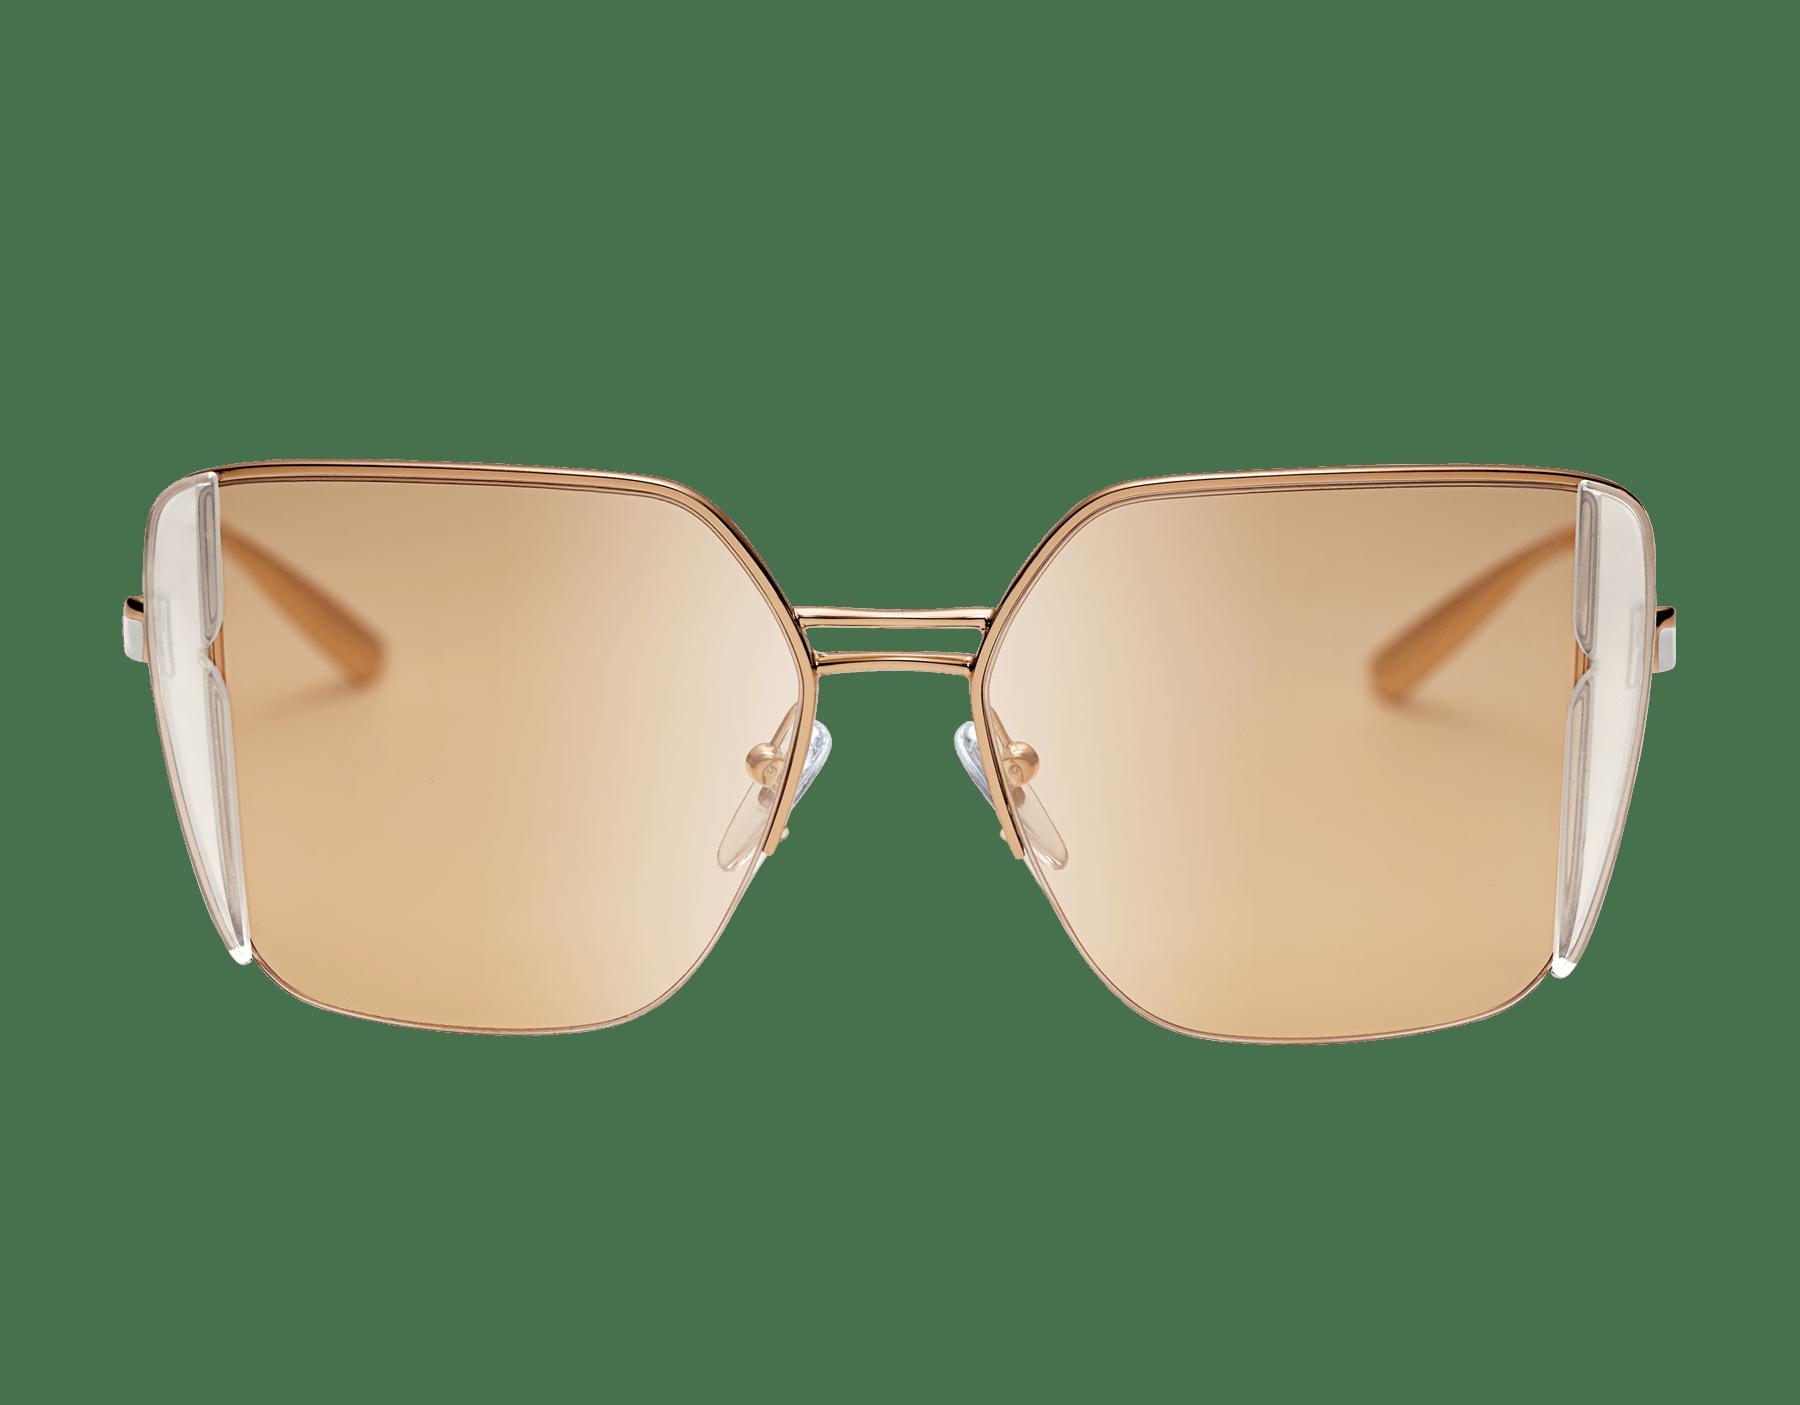 Bulgari B.zero1 B.purebright metal squared sunglasses. 903948 image 2